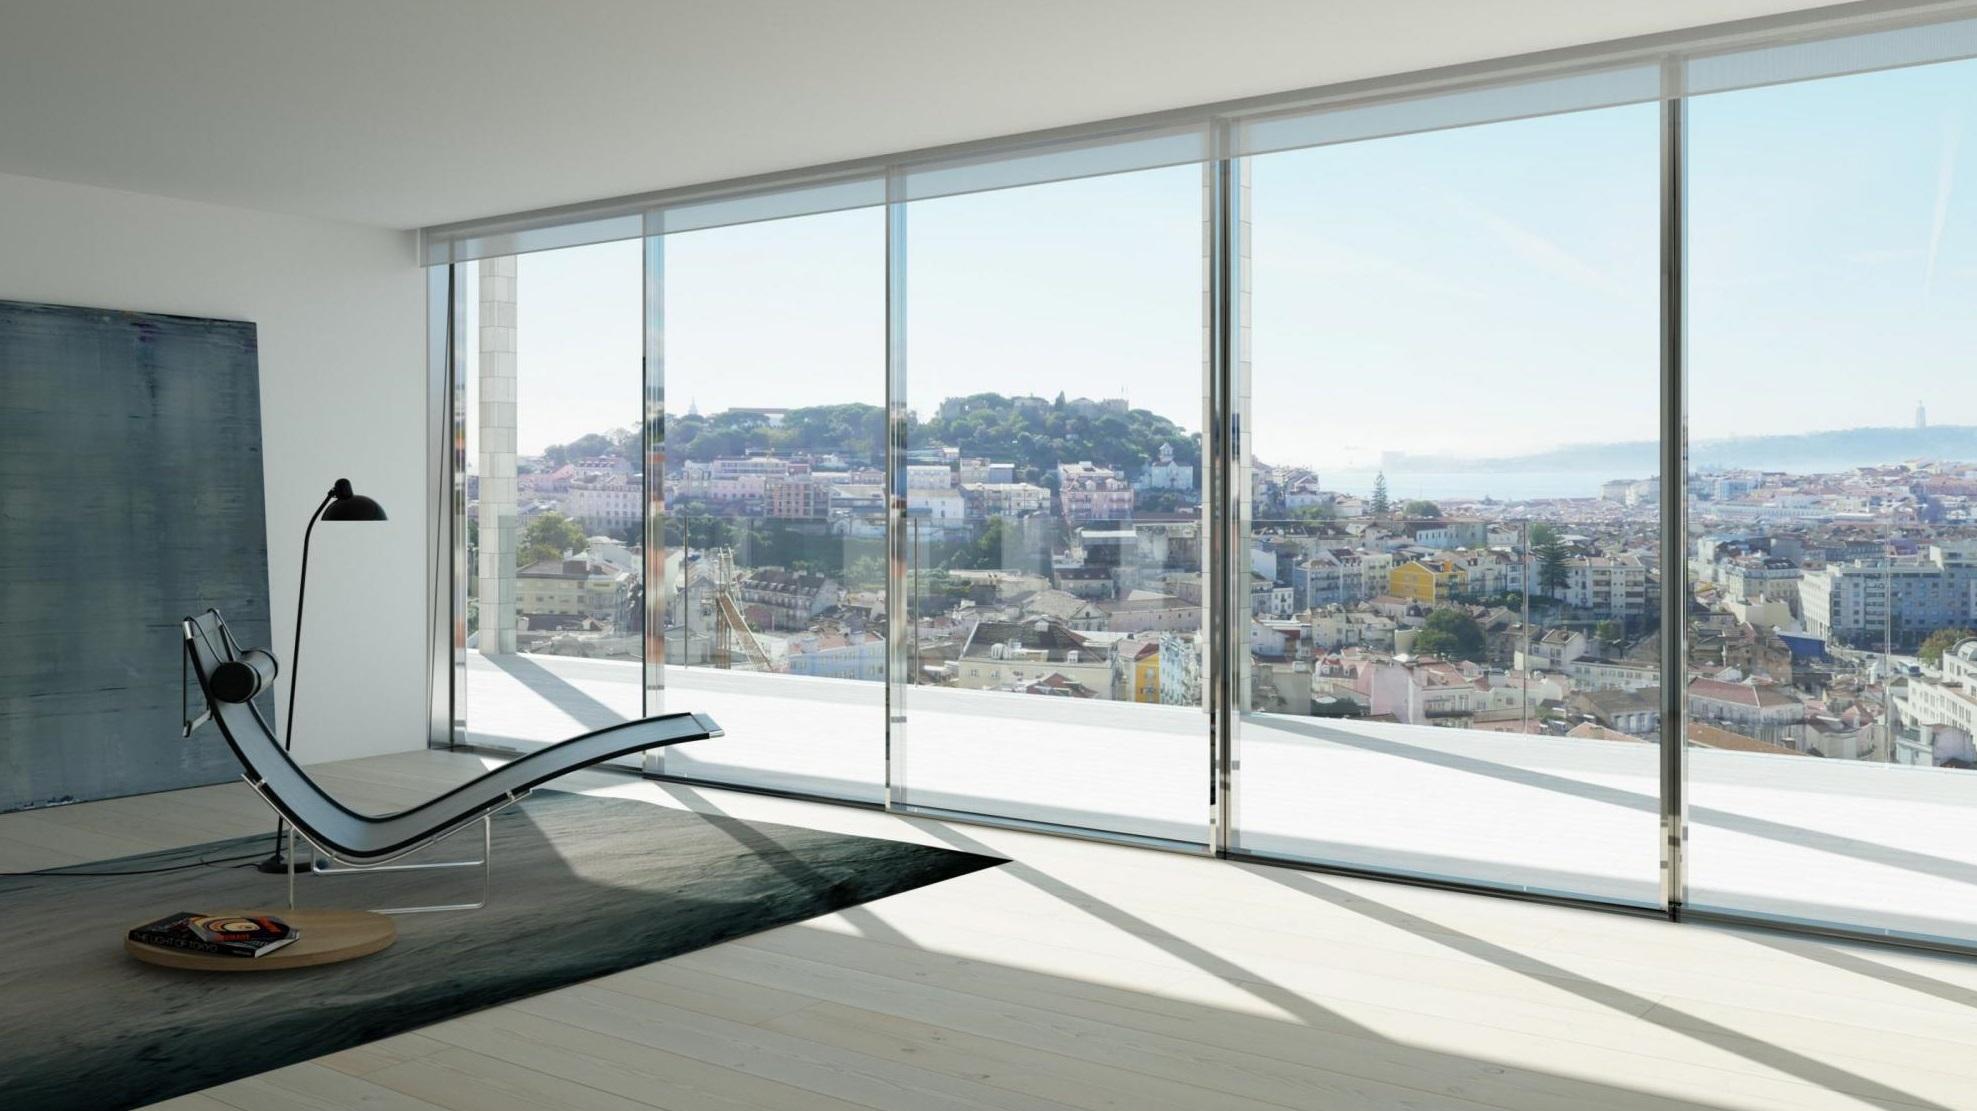 Terraços do Monte / Vision Real Estate Solutions